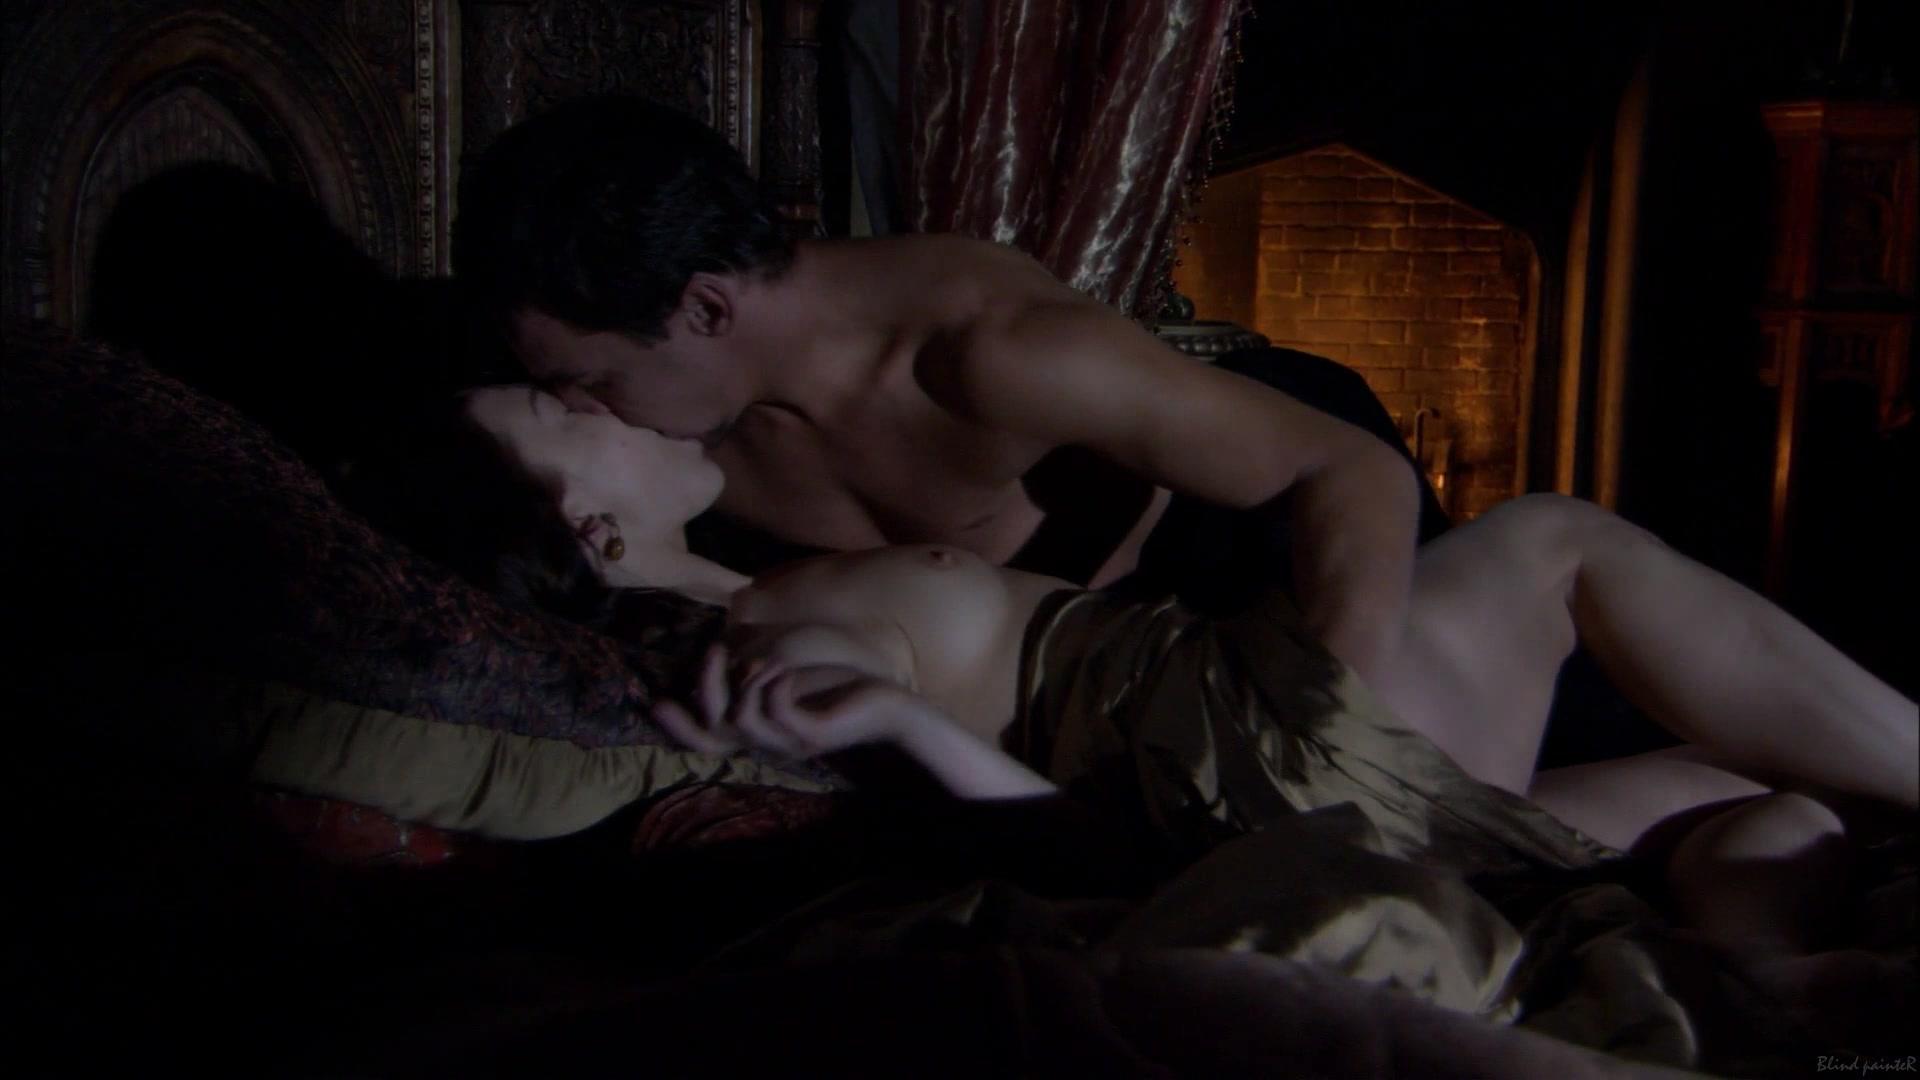 Natalie dormer tudors nude